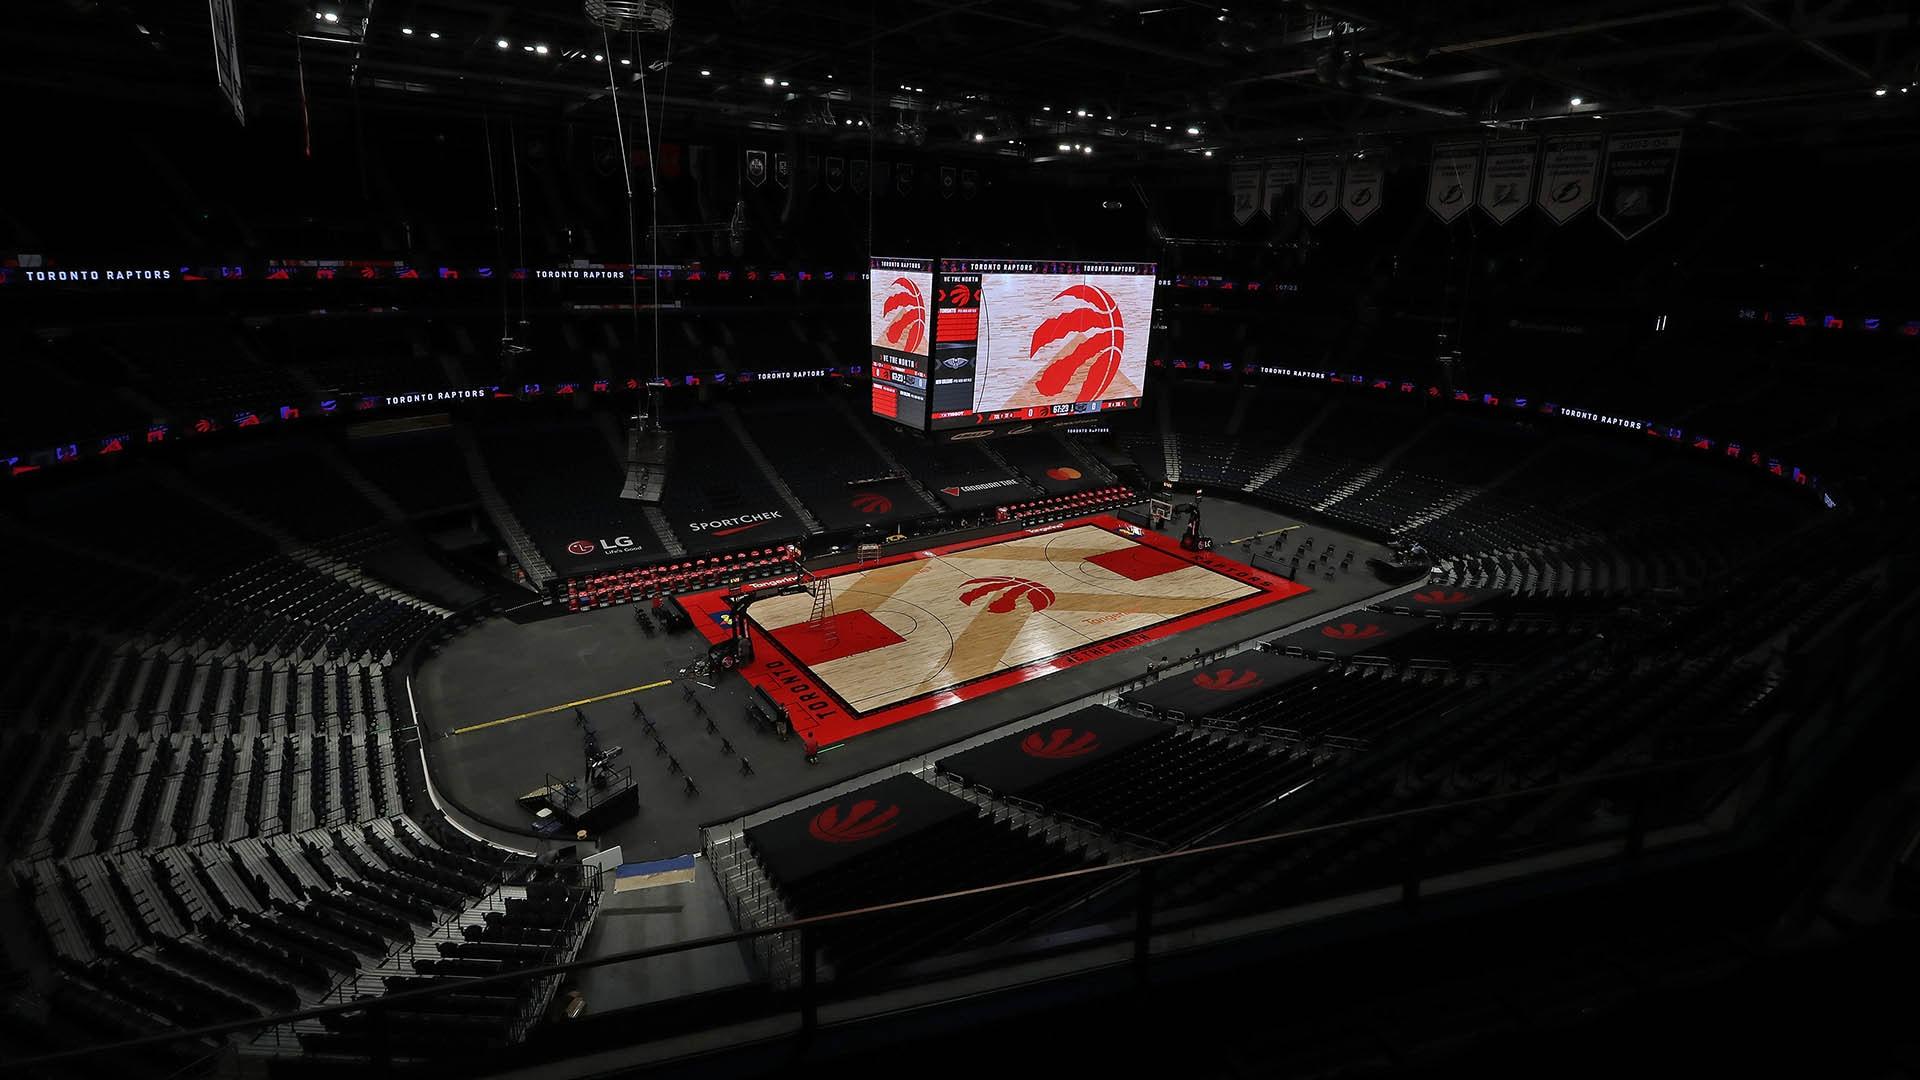 Raptors to finish 2020-21 season in Tampa